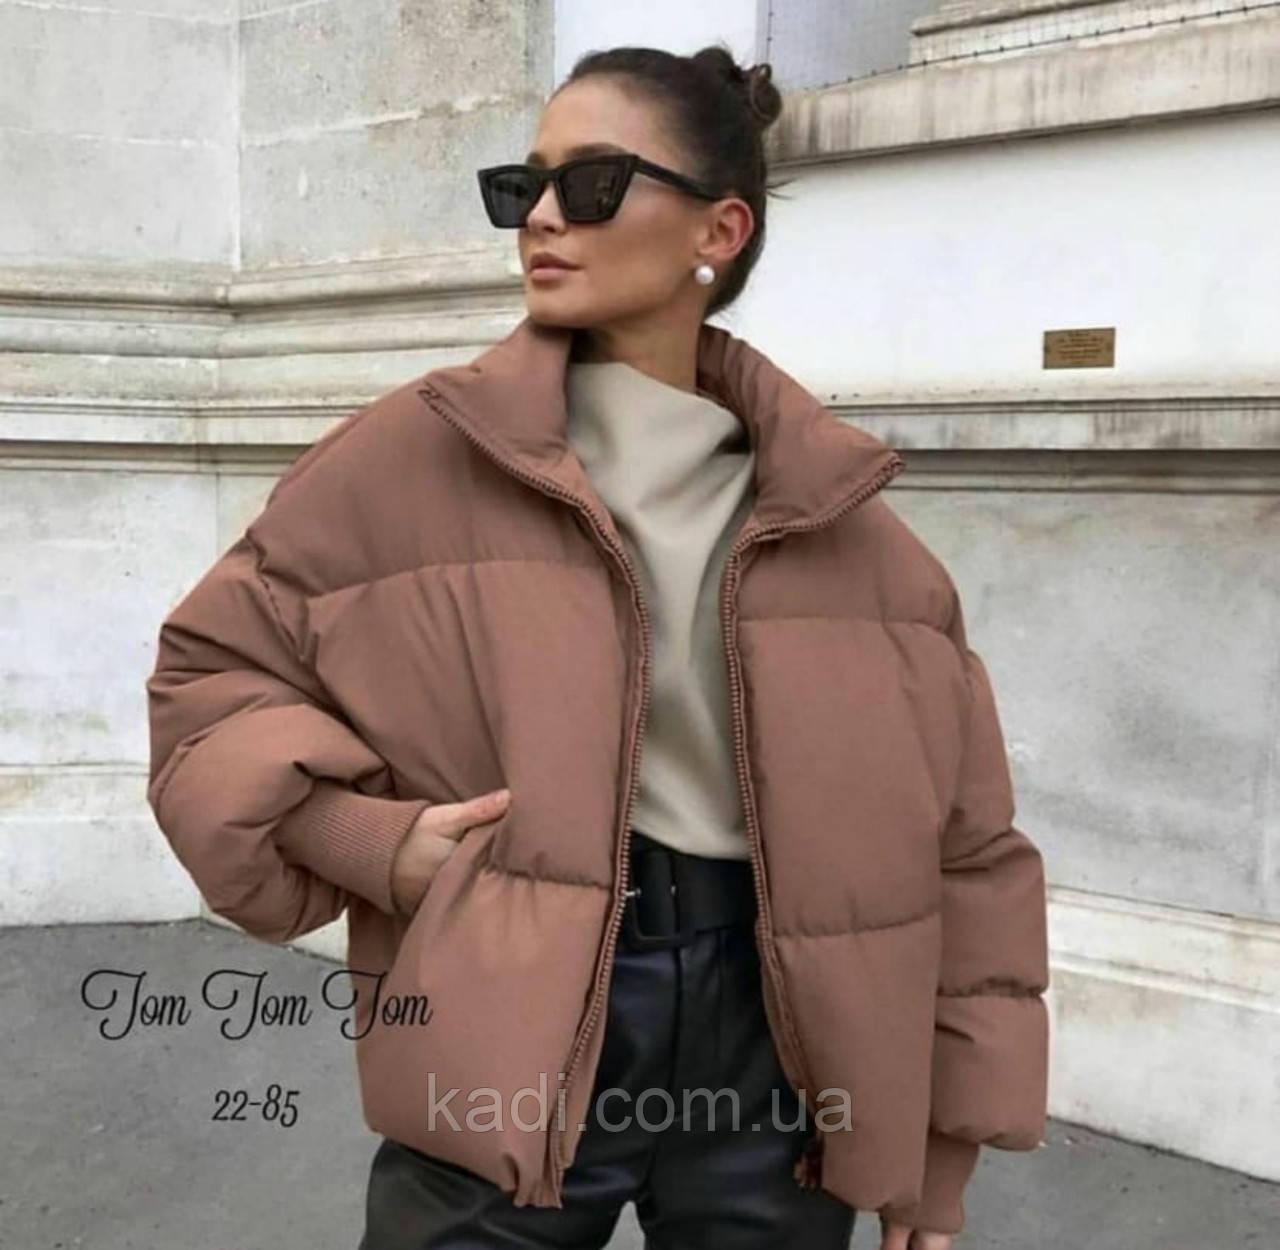 Короткая куртка с манжетами / арт.723